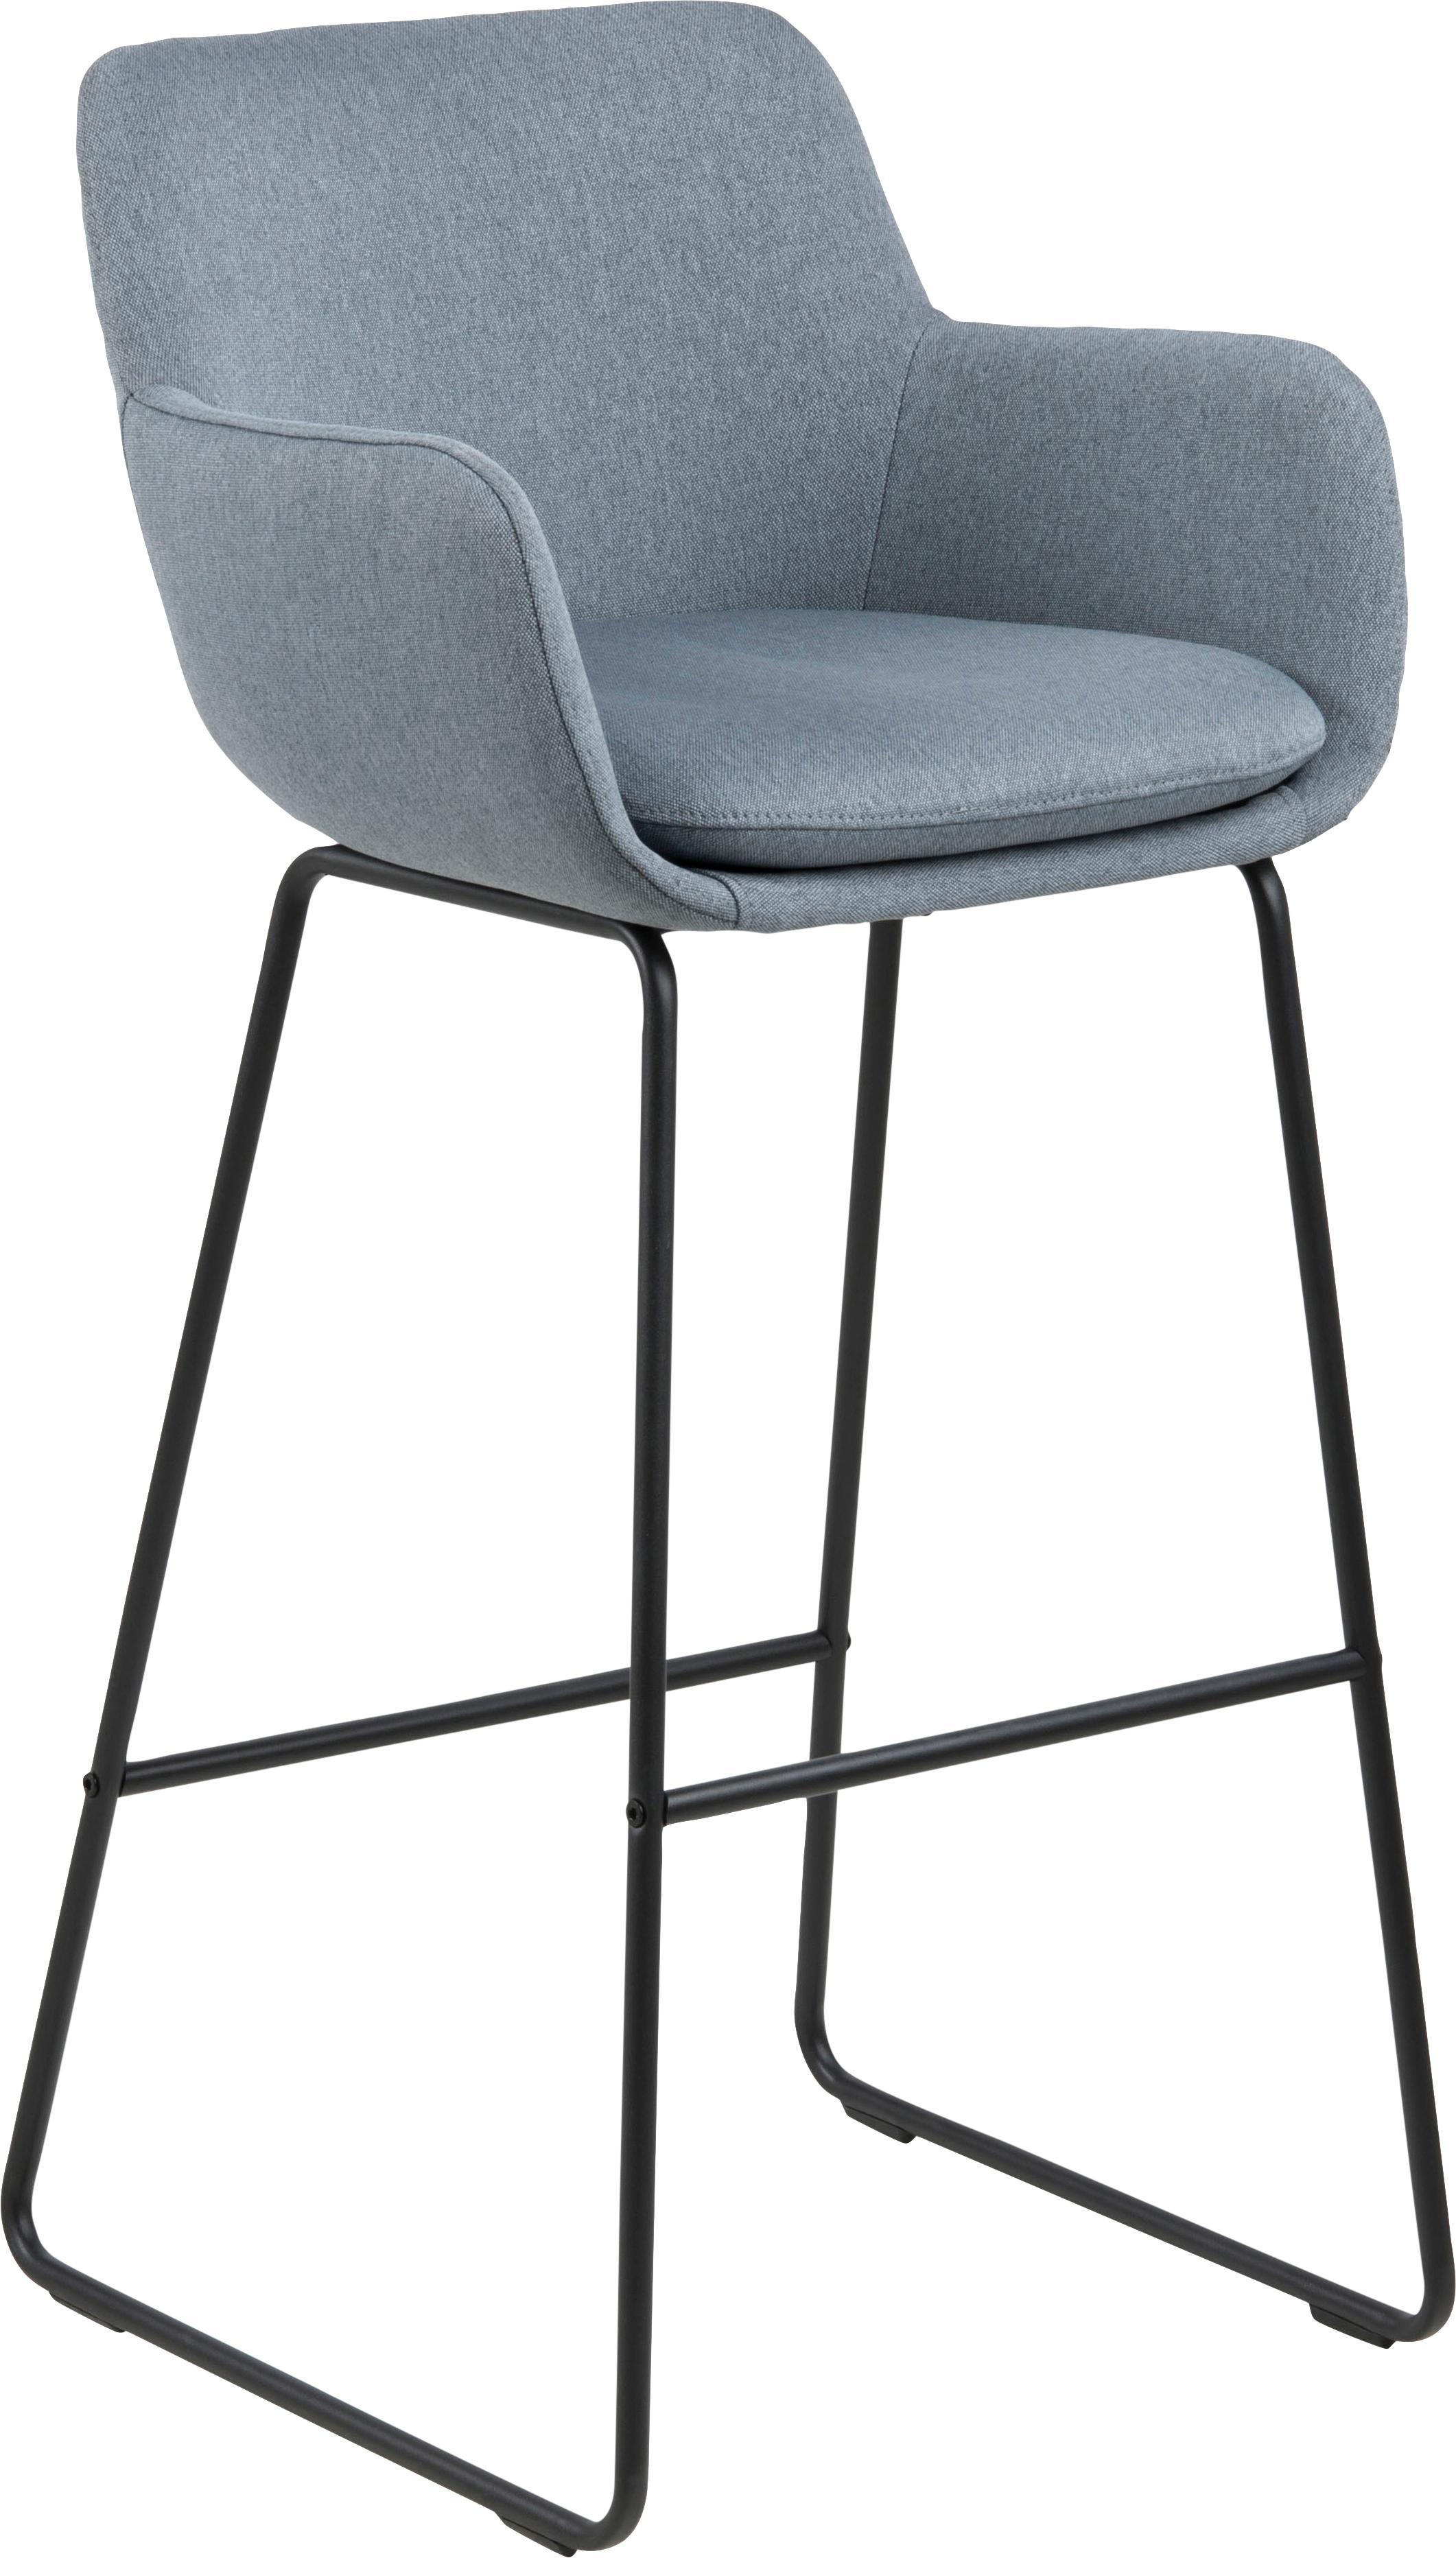 Sedia da bar Lisa 2 pz, Rivestimento: poliestere, Struttura: metallo verniciato a polv, Grigio blu, Larg. 51 x Alt. 103 cm